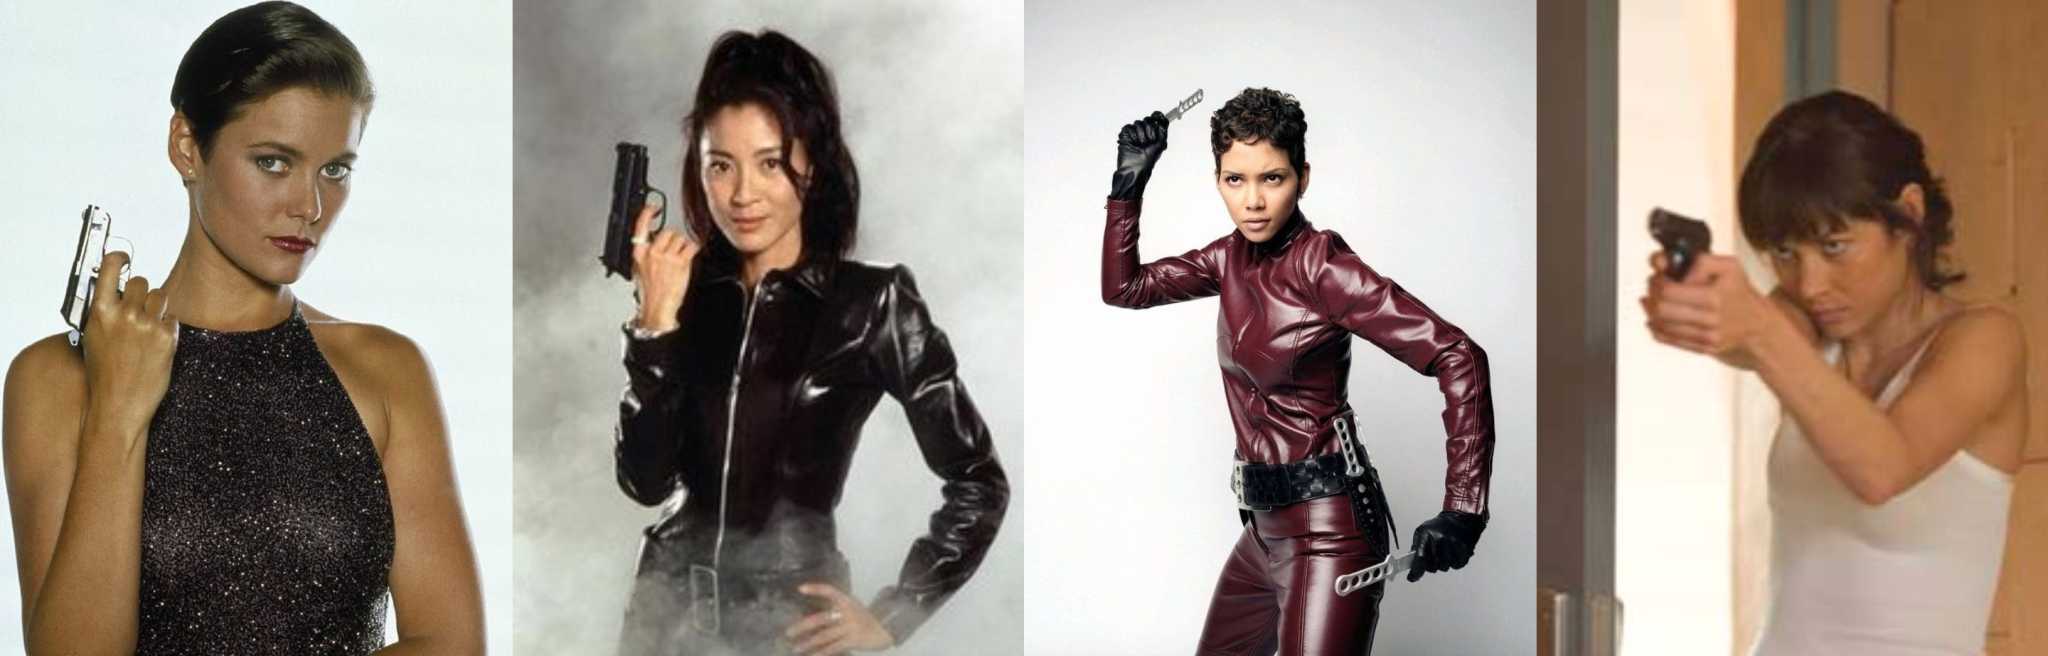 Female Bond Spin-offs